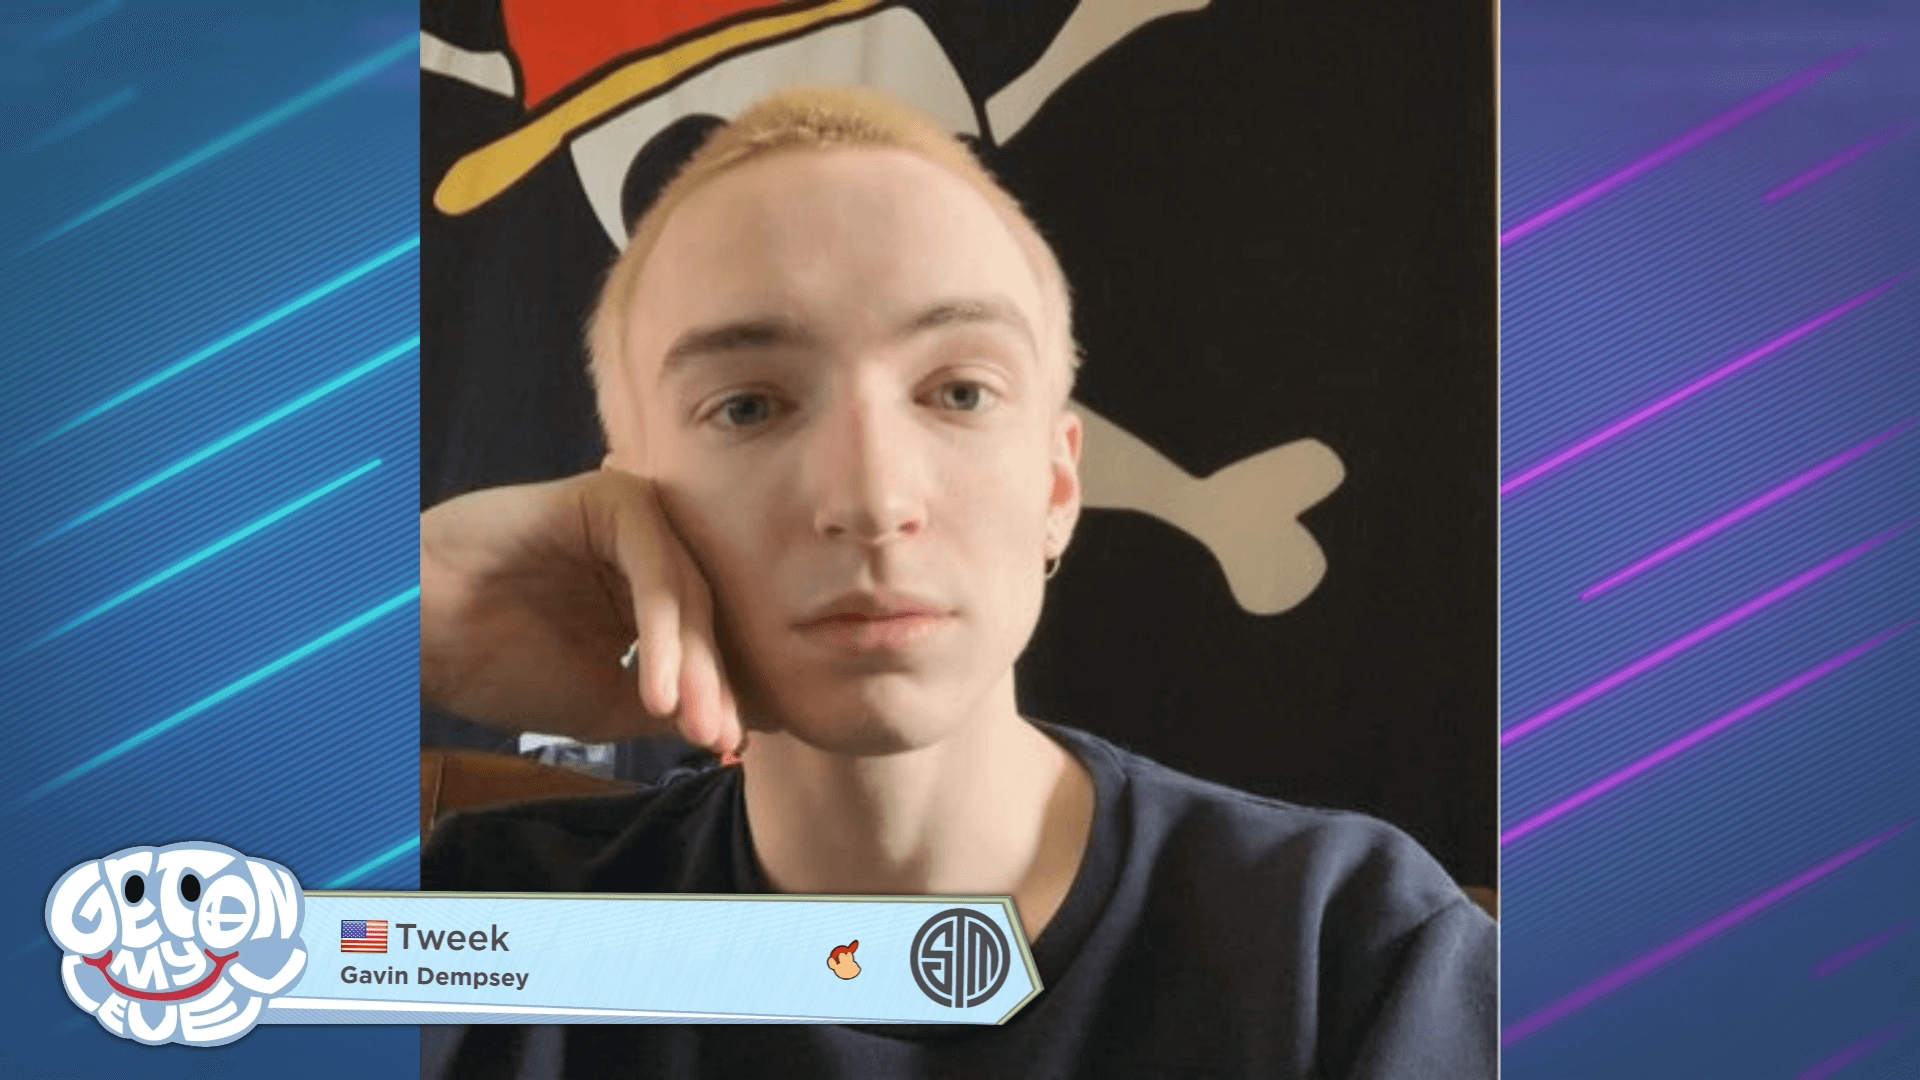 Tweek wins Get On My Line 2020, an Online Smash Event